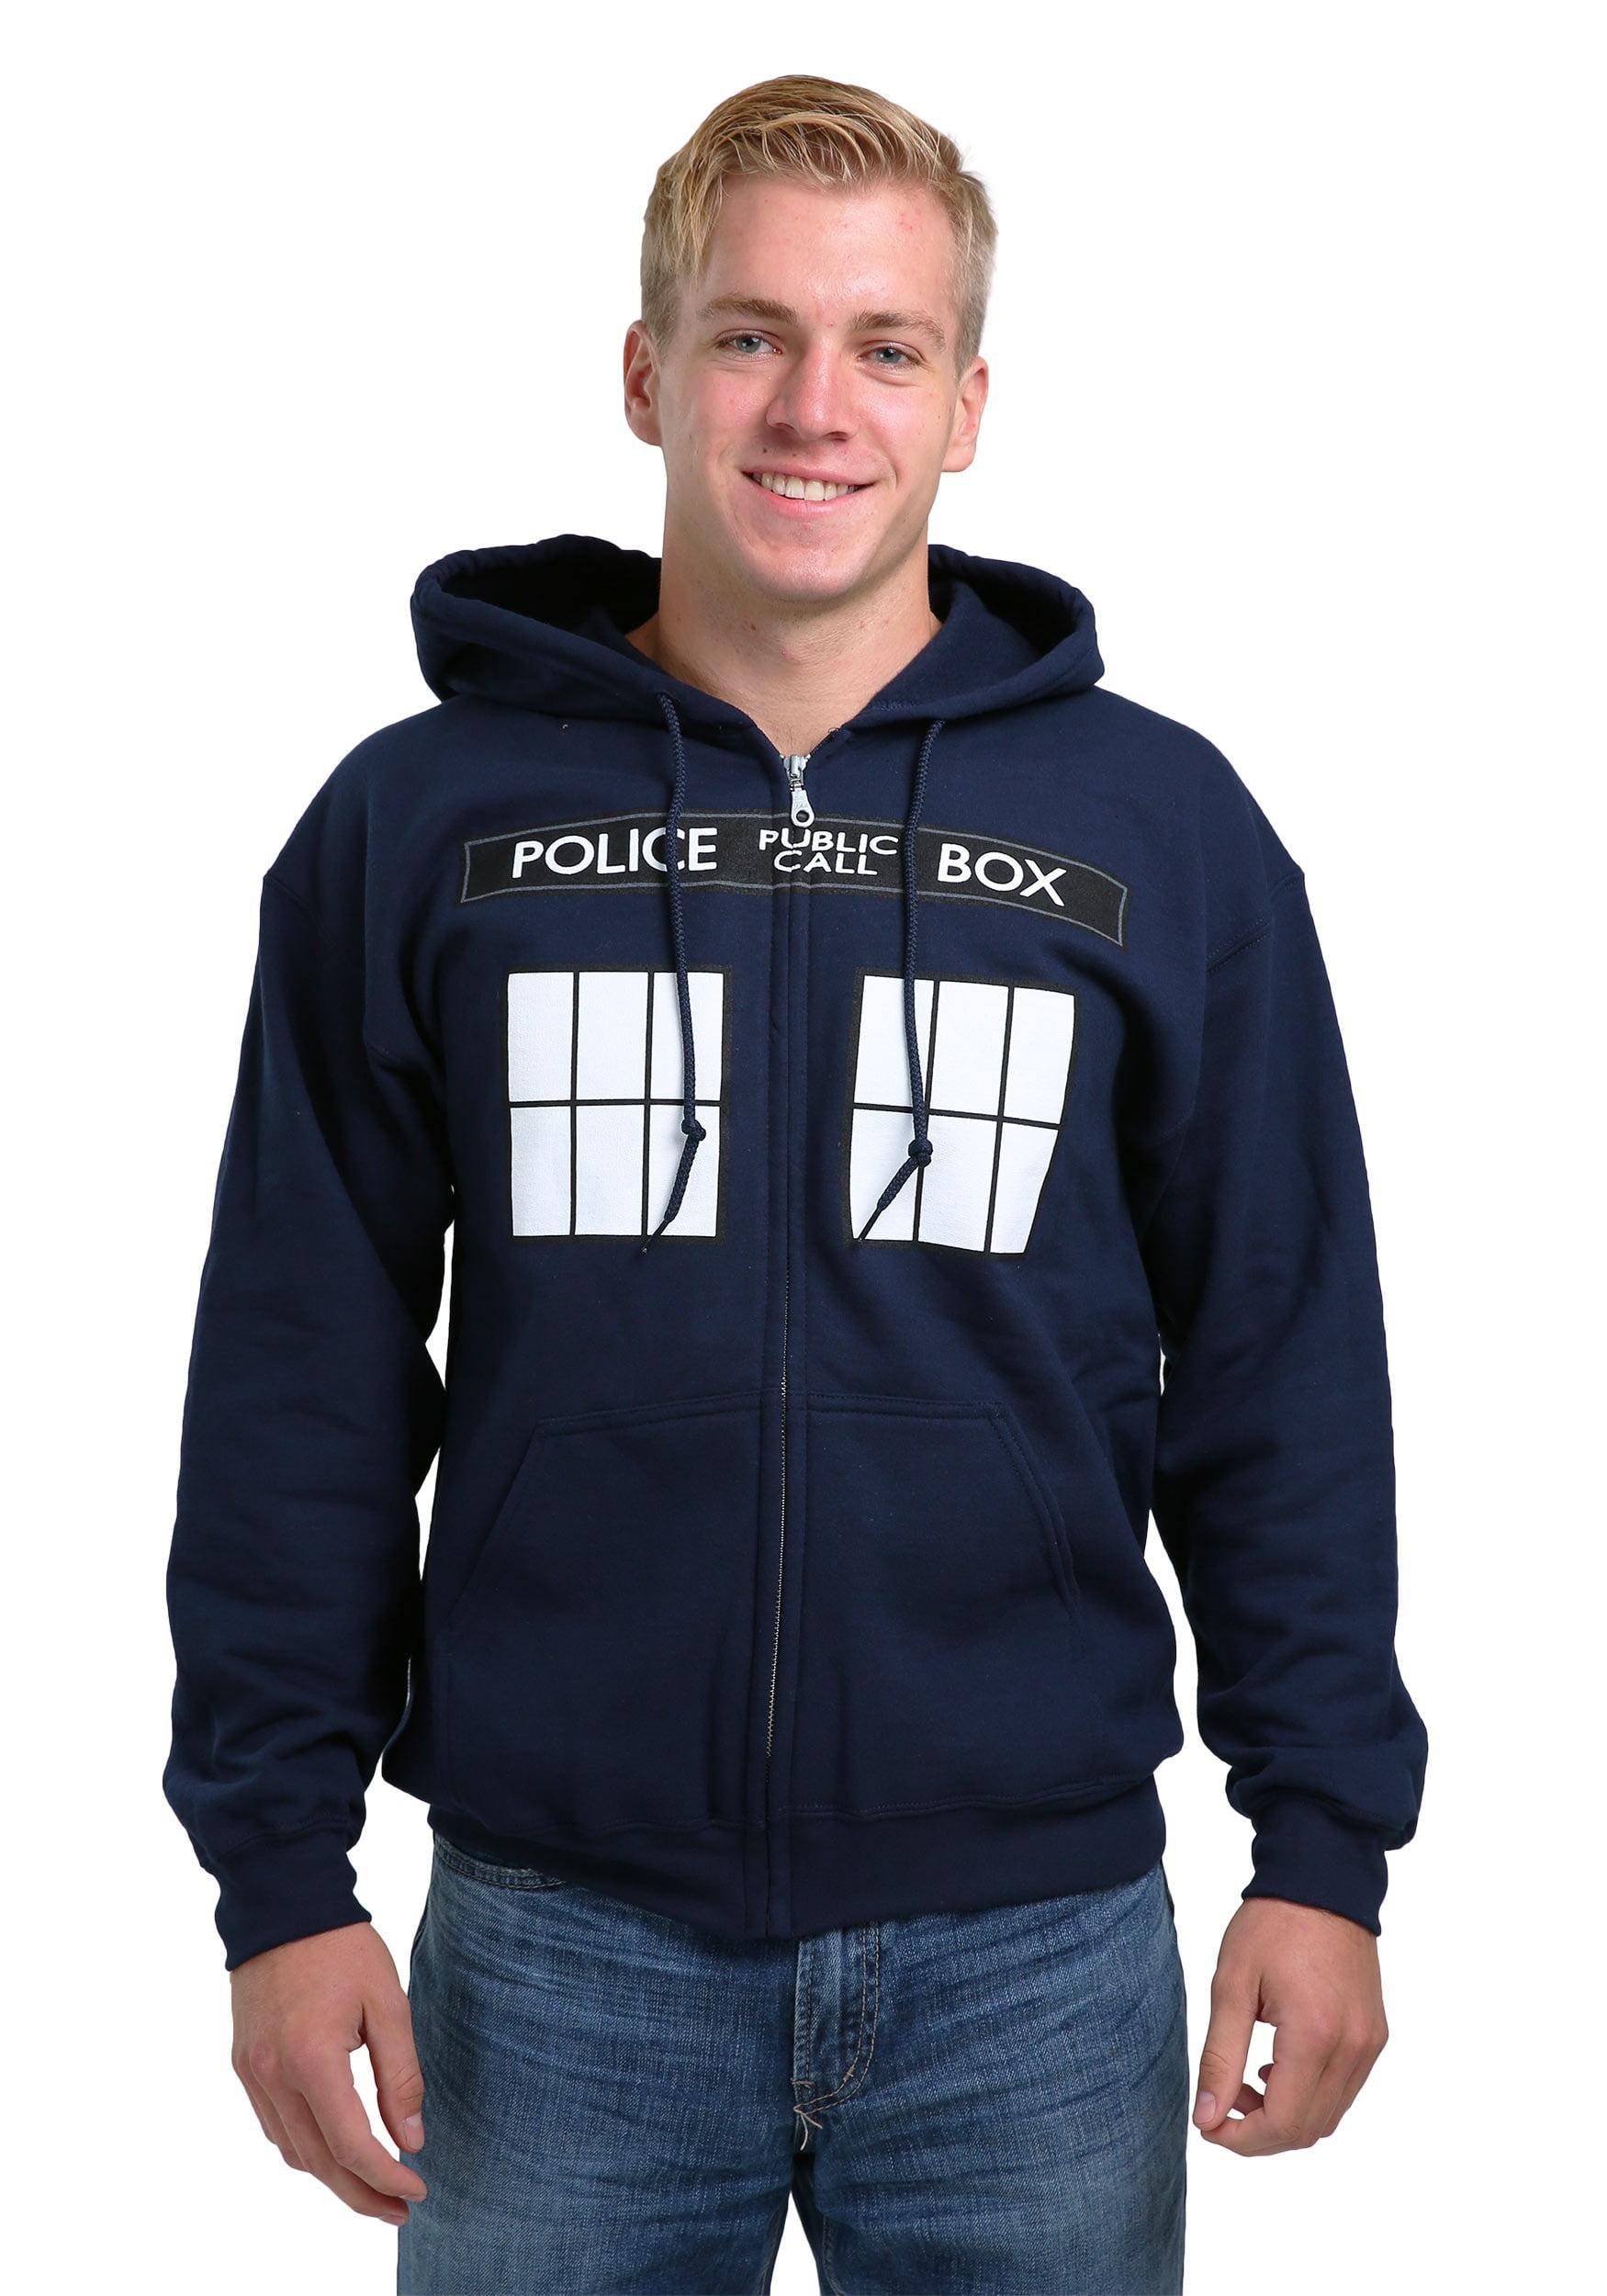 Doctor Who Tardis Costume   Casual zipper hoodies jackets outdoor